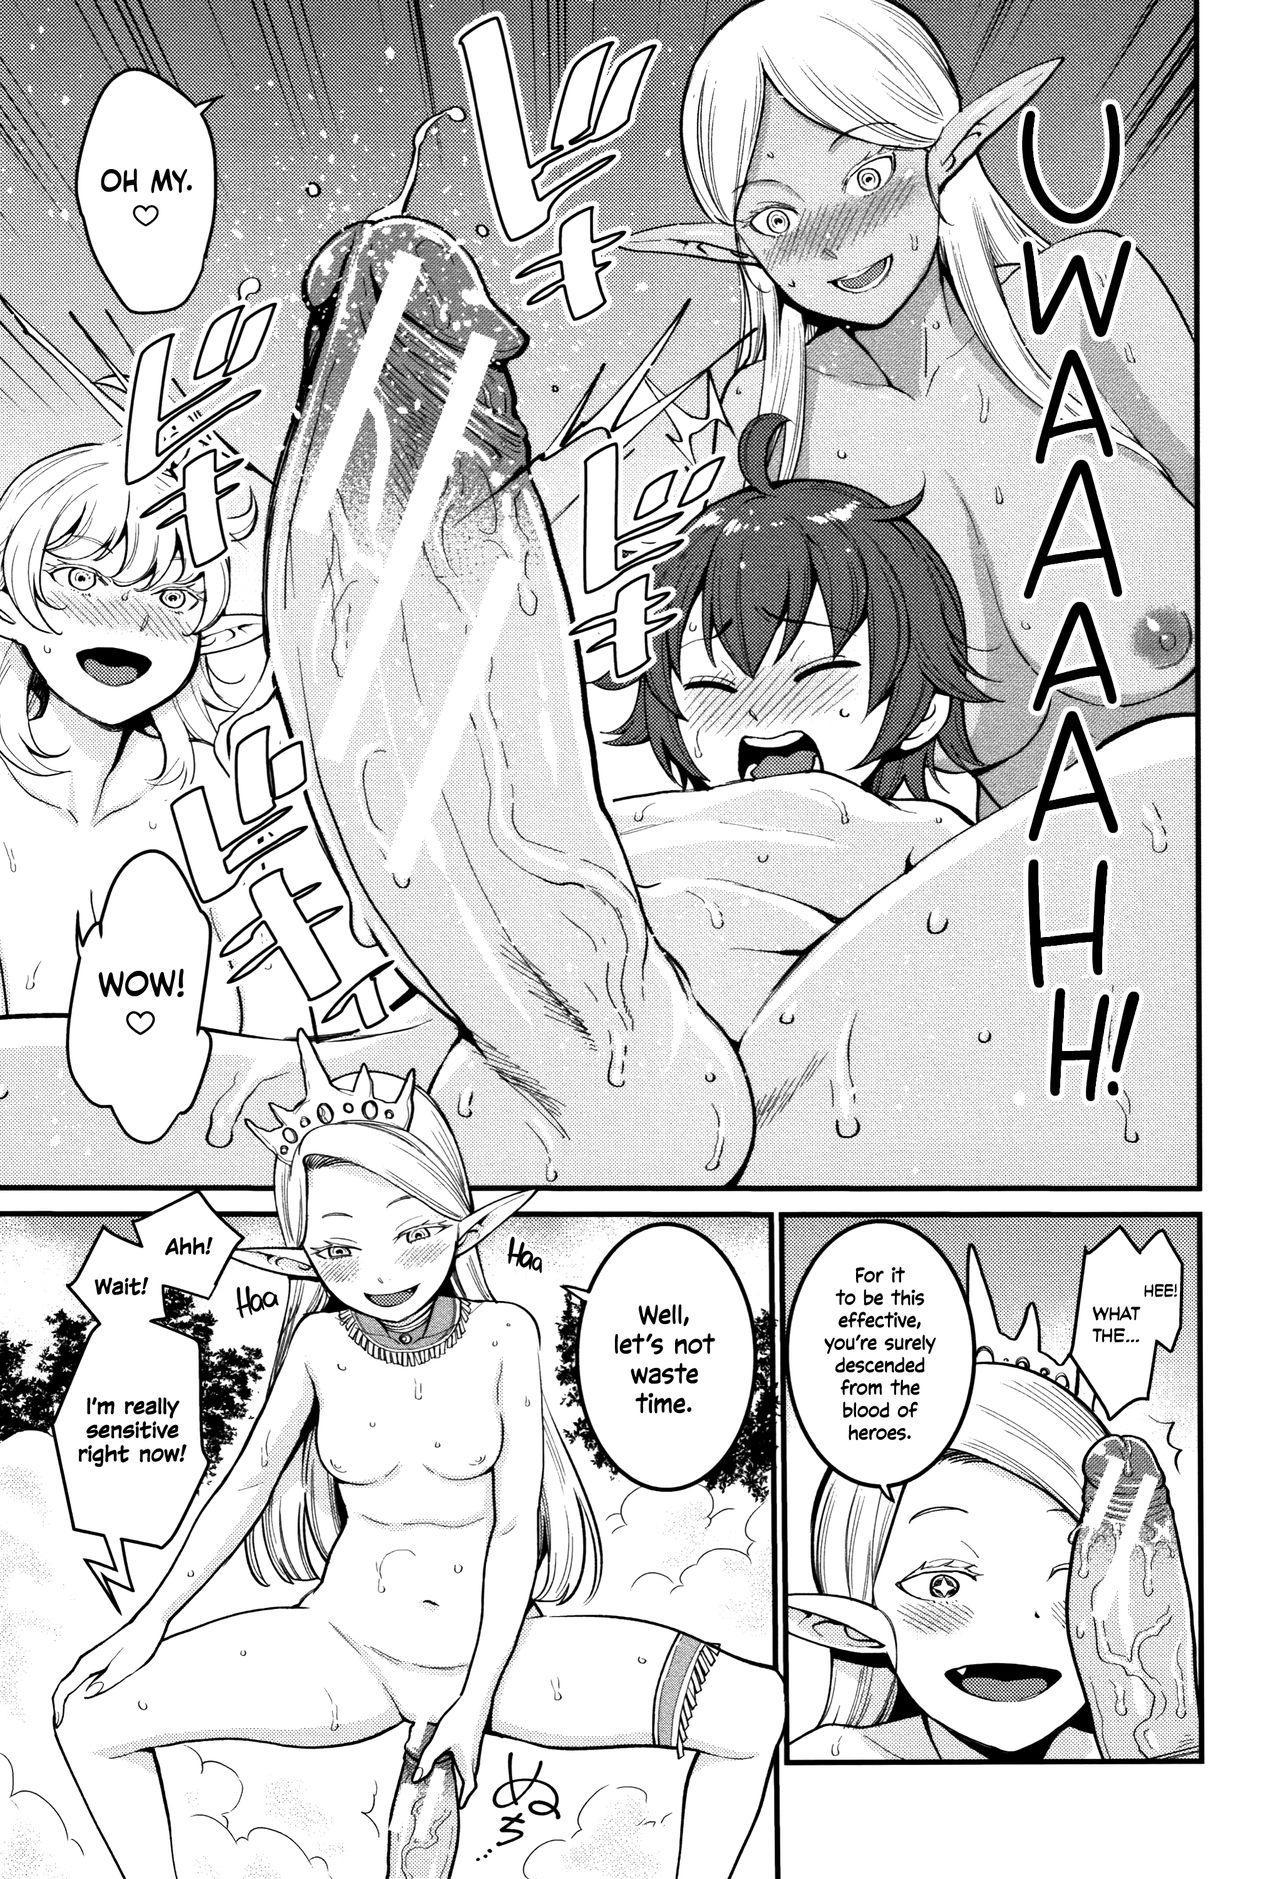 [Agata] ChinTrai Quest II ~Shota Yuusha Elf no Sato de Dairankou~   Dick Training Quest II ~Little Hero's Huge Orgy At the Elf Village~ (Chou One x Pako³) [English] =TLL + mrwayne= 12